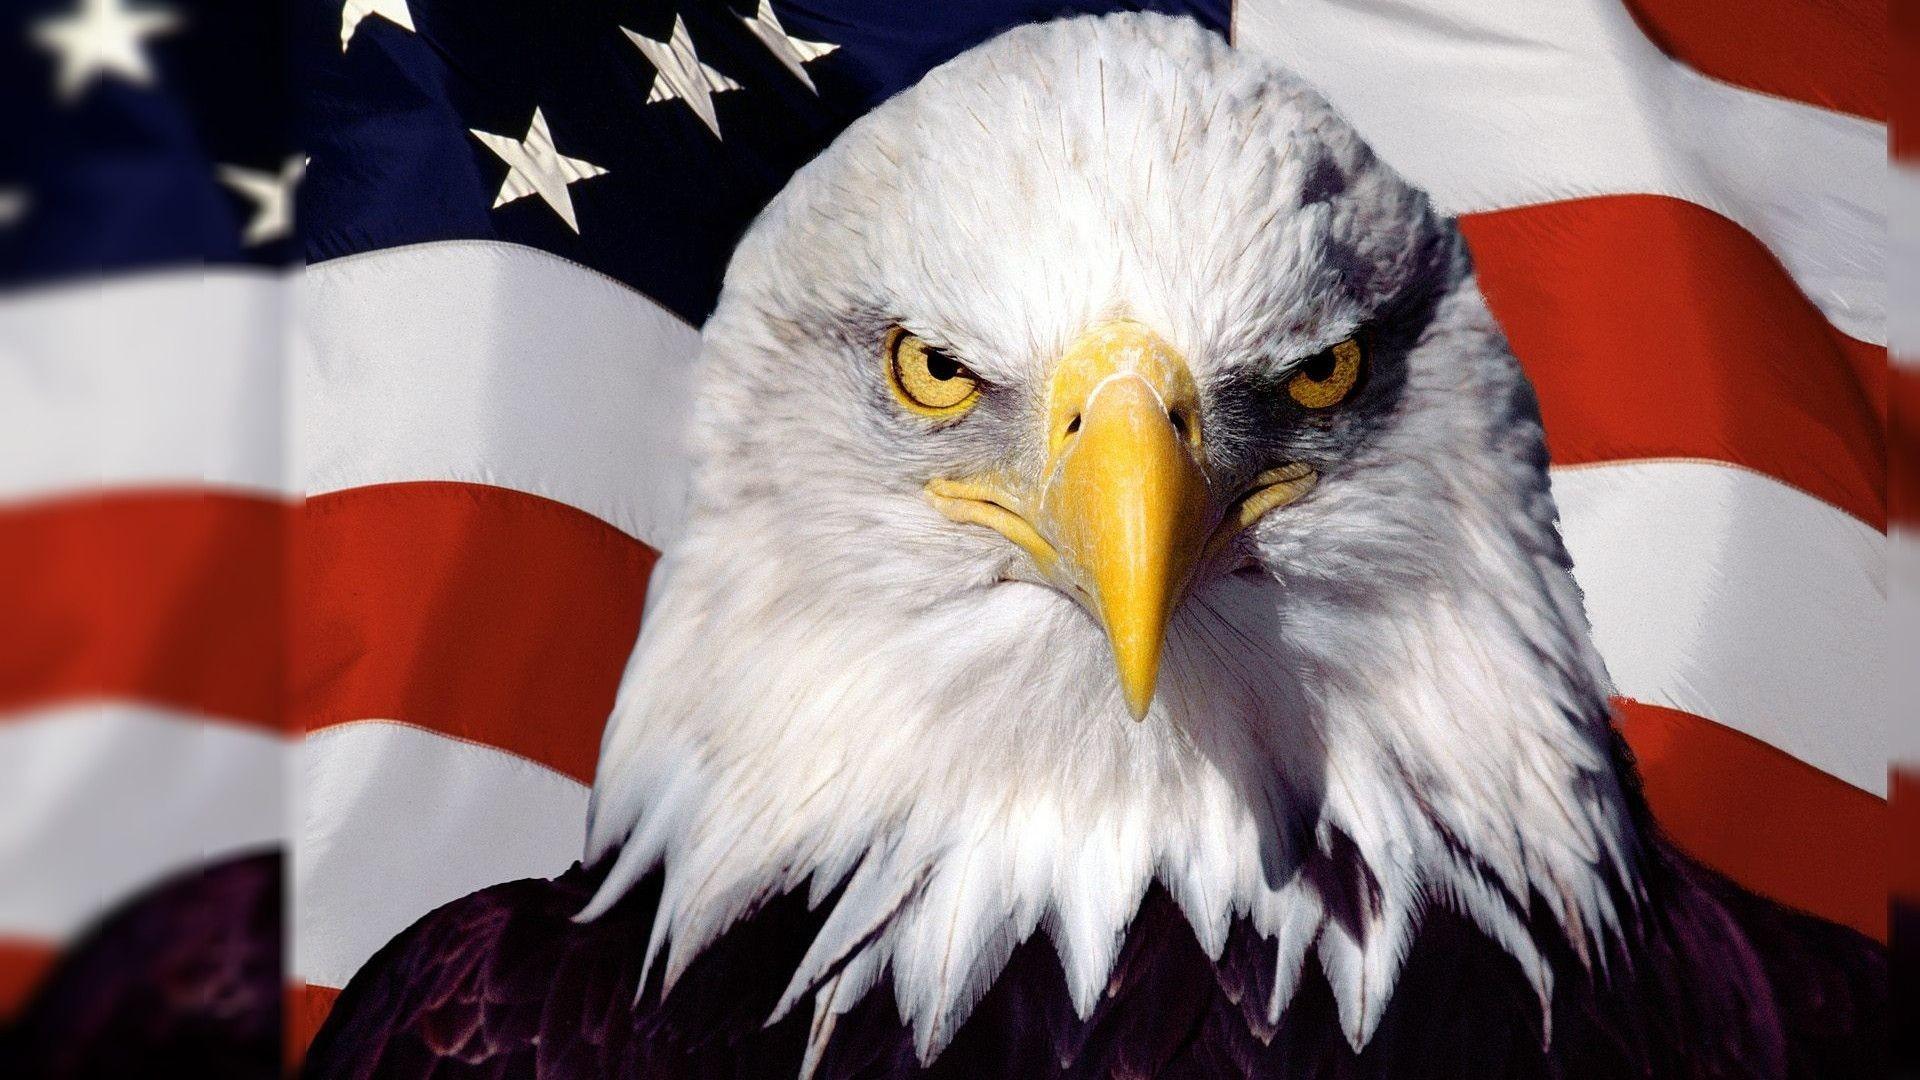 0 american flag wallpaper 17K wallpapertp american flag wallpaper HD